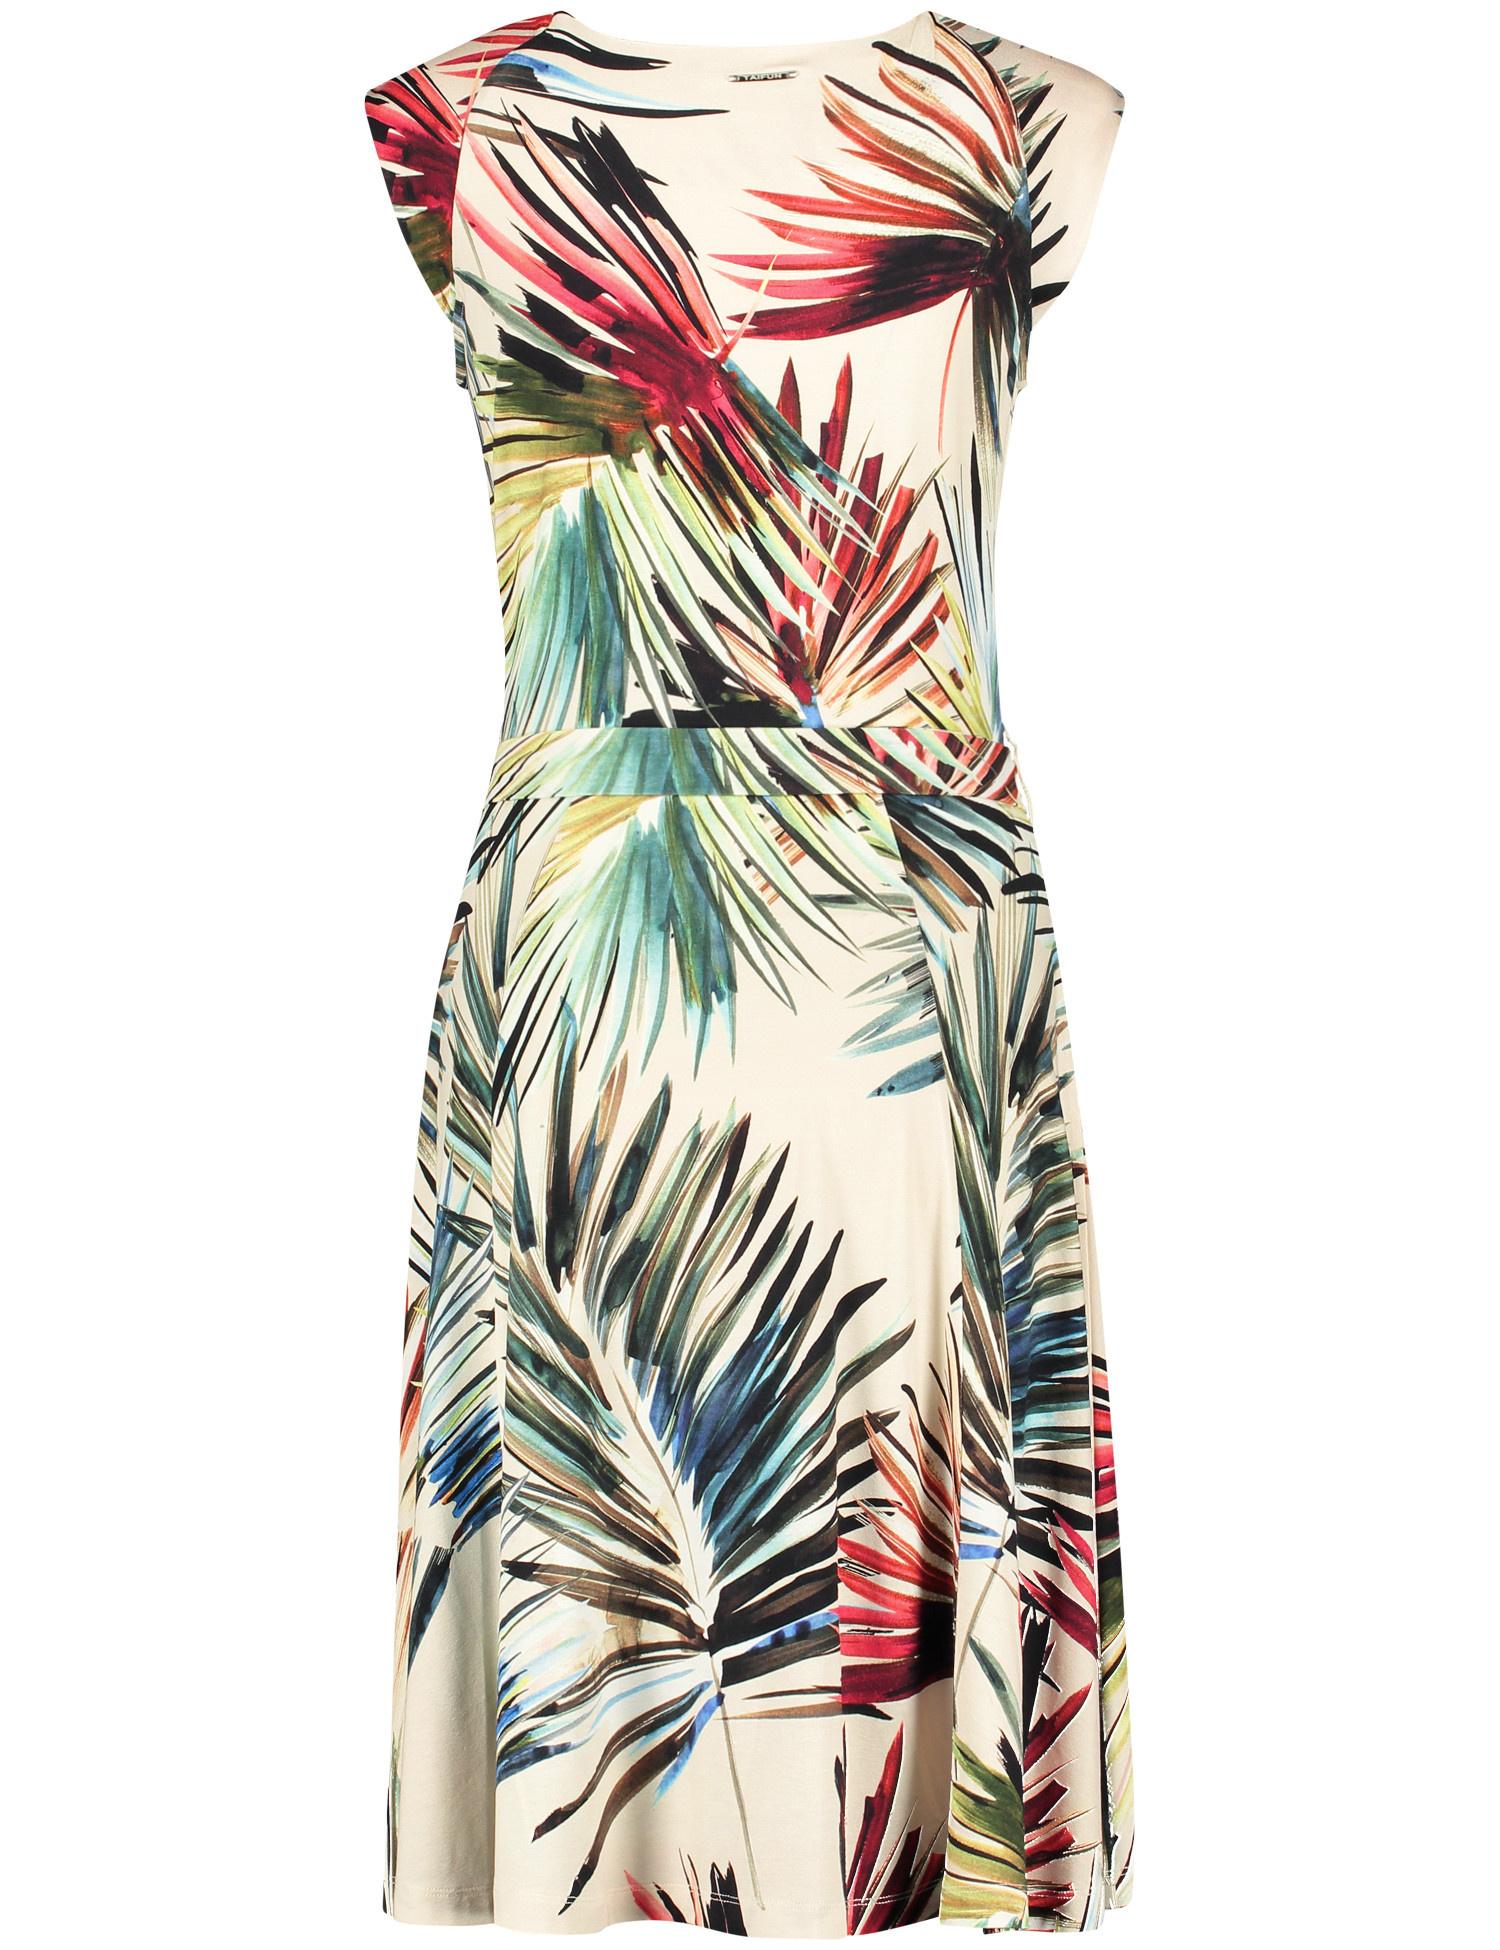 TAIFUN robe imprimé-2